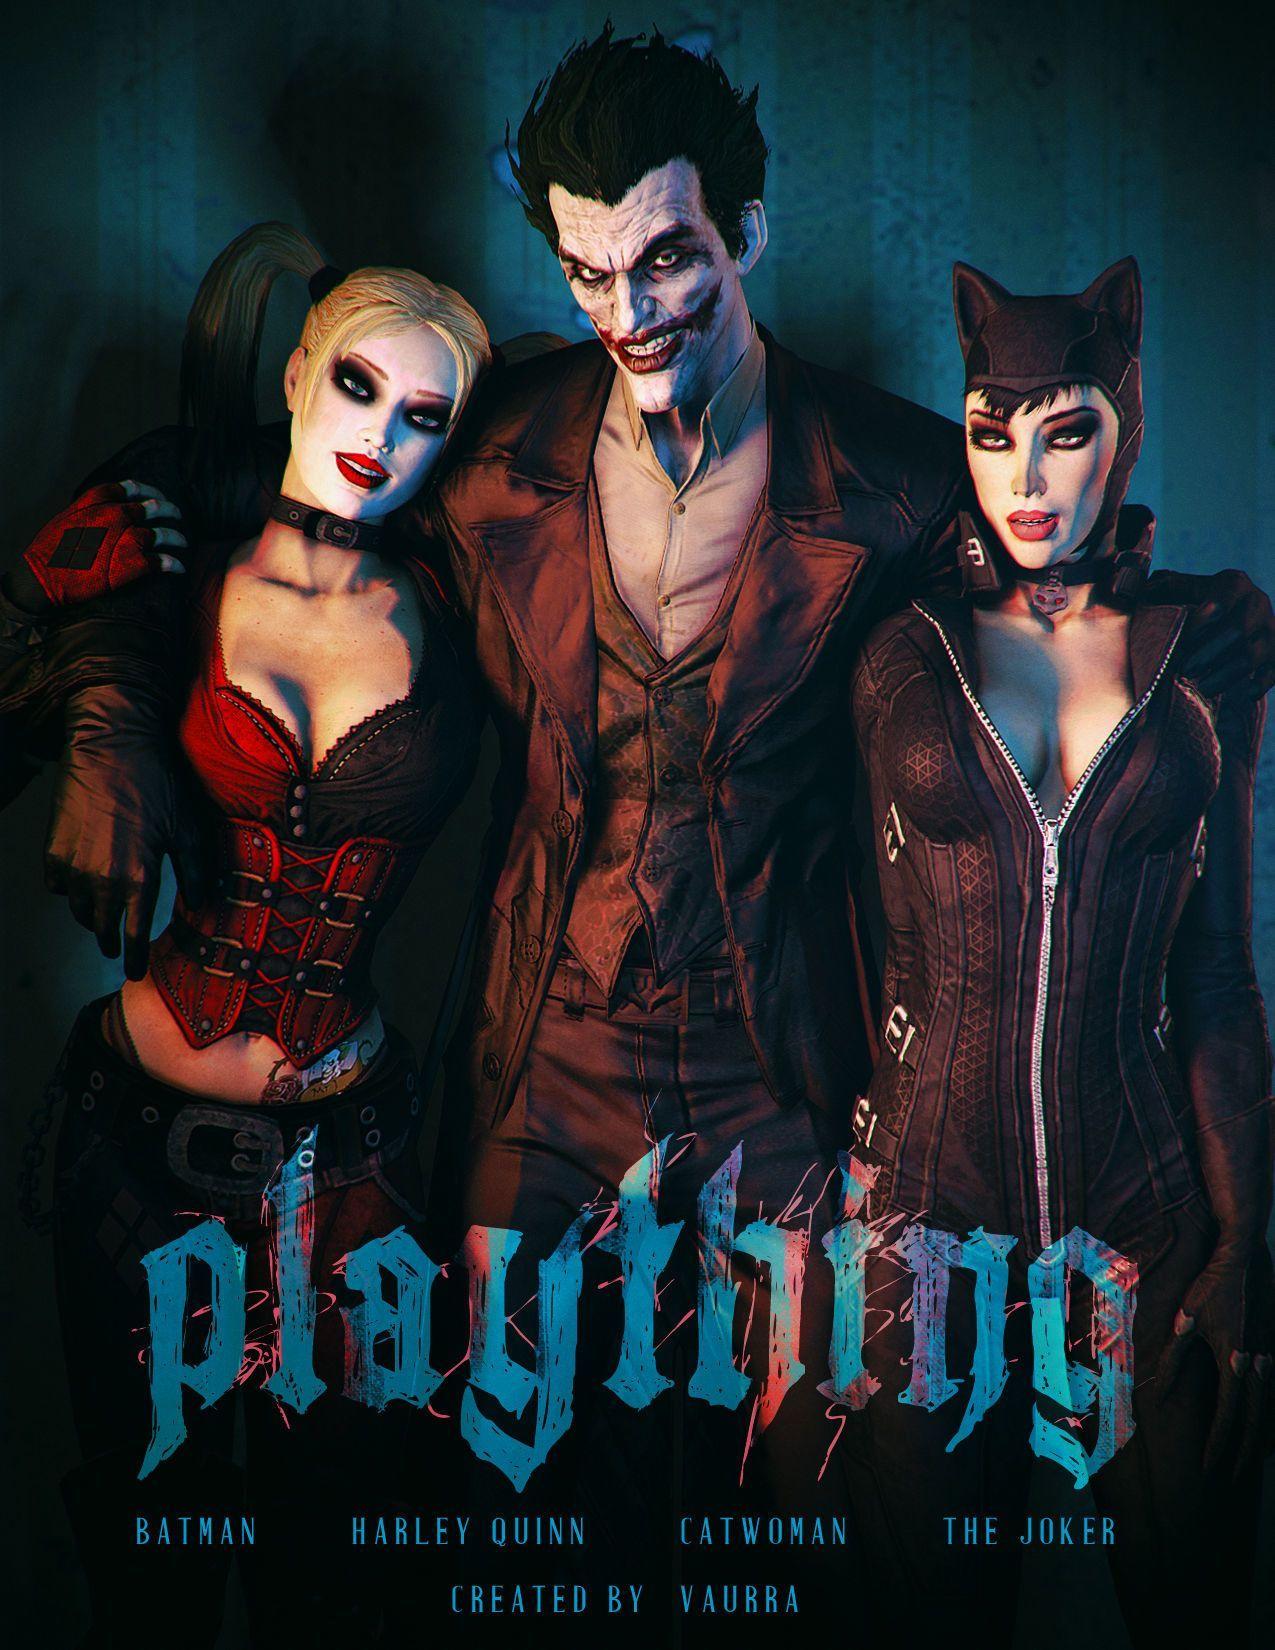 [Vaurra] Plaything (Batman)